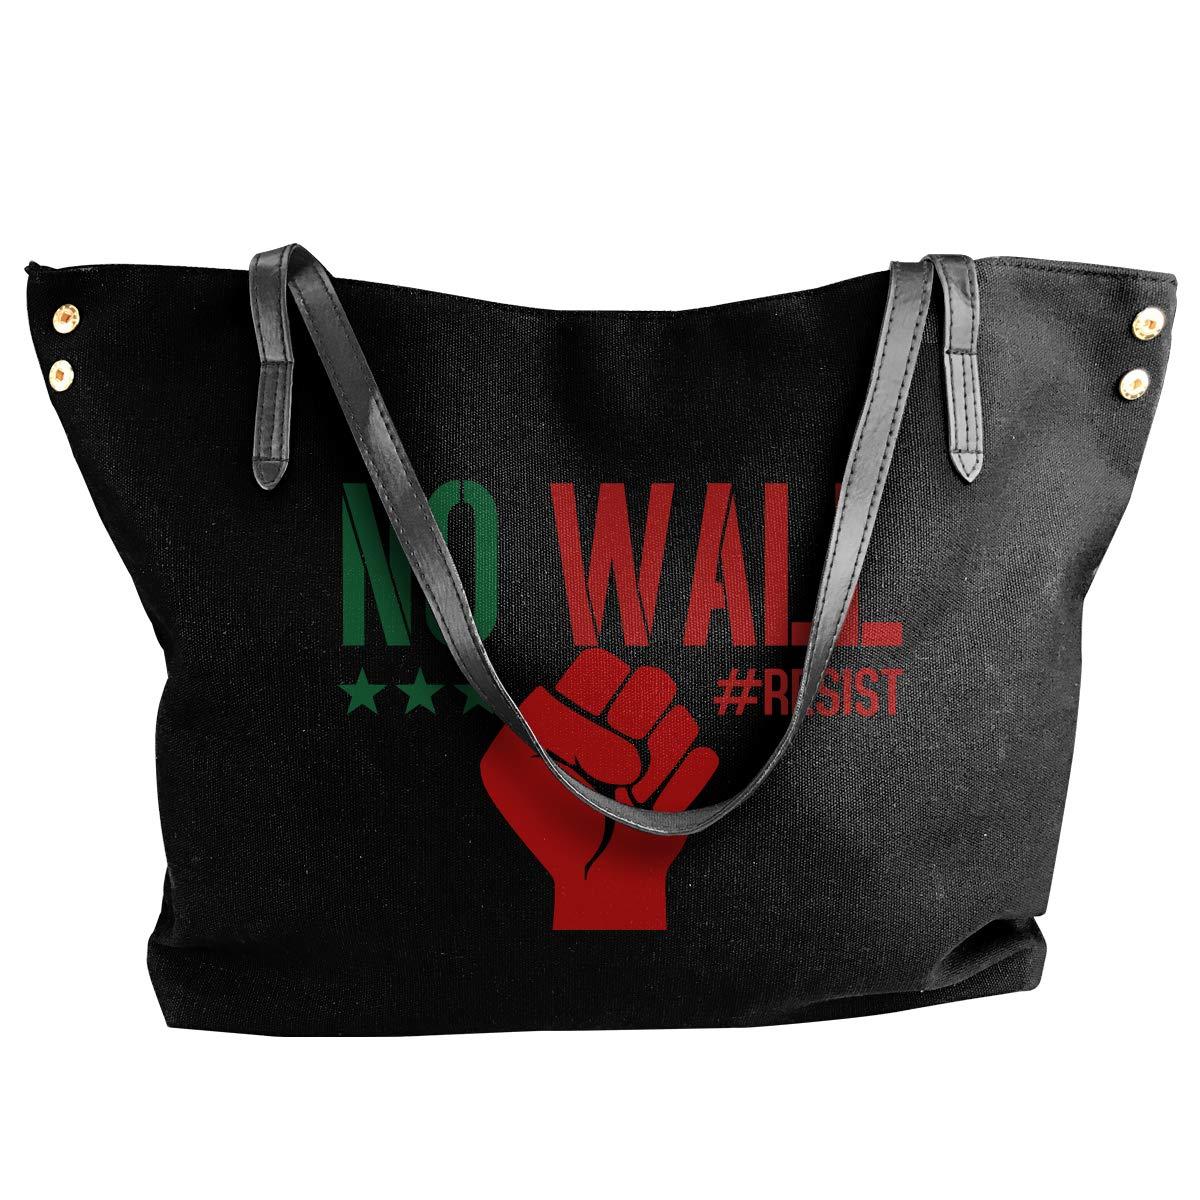 Womens Canvas Large Tote Shoulder Handbag No Wall Handbags